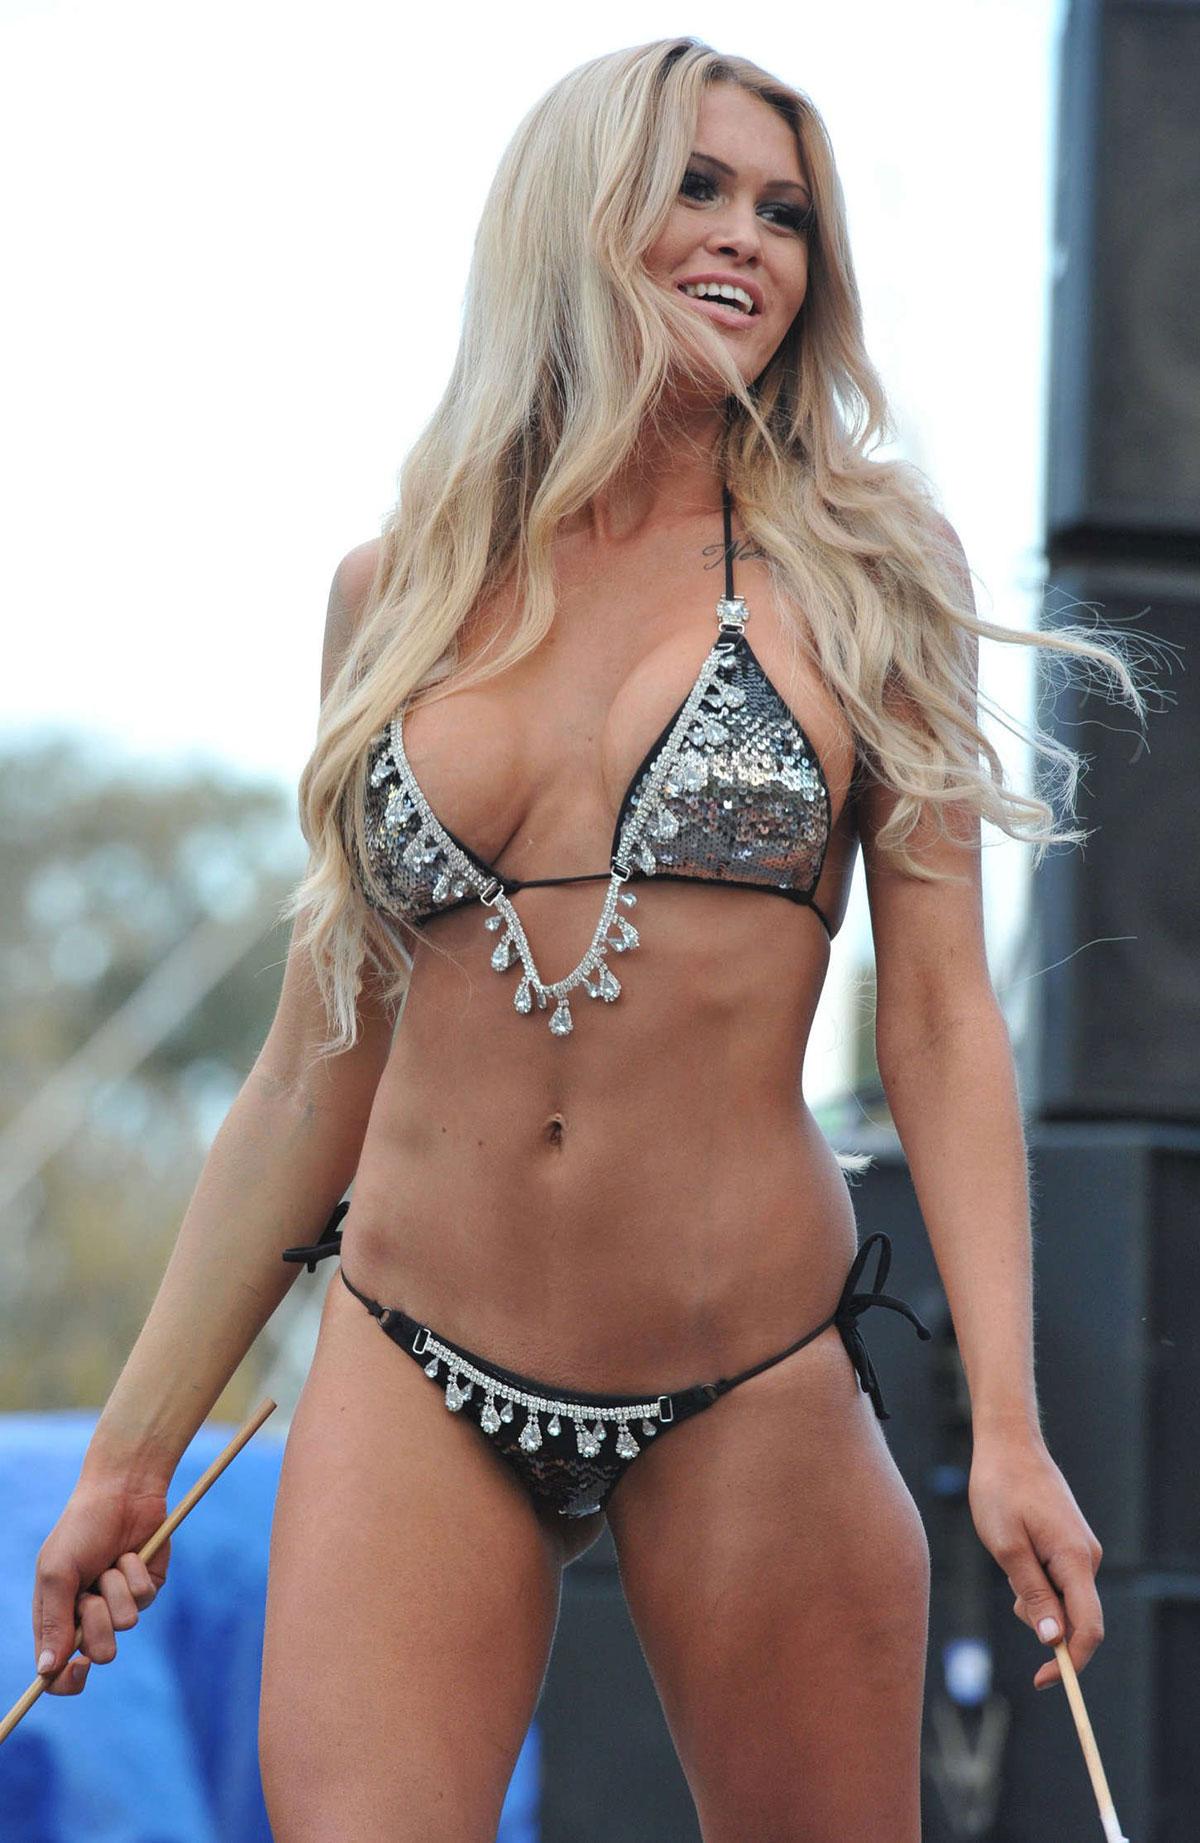 Bikini comp photos